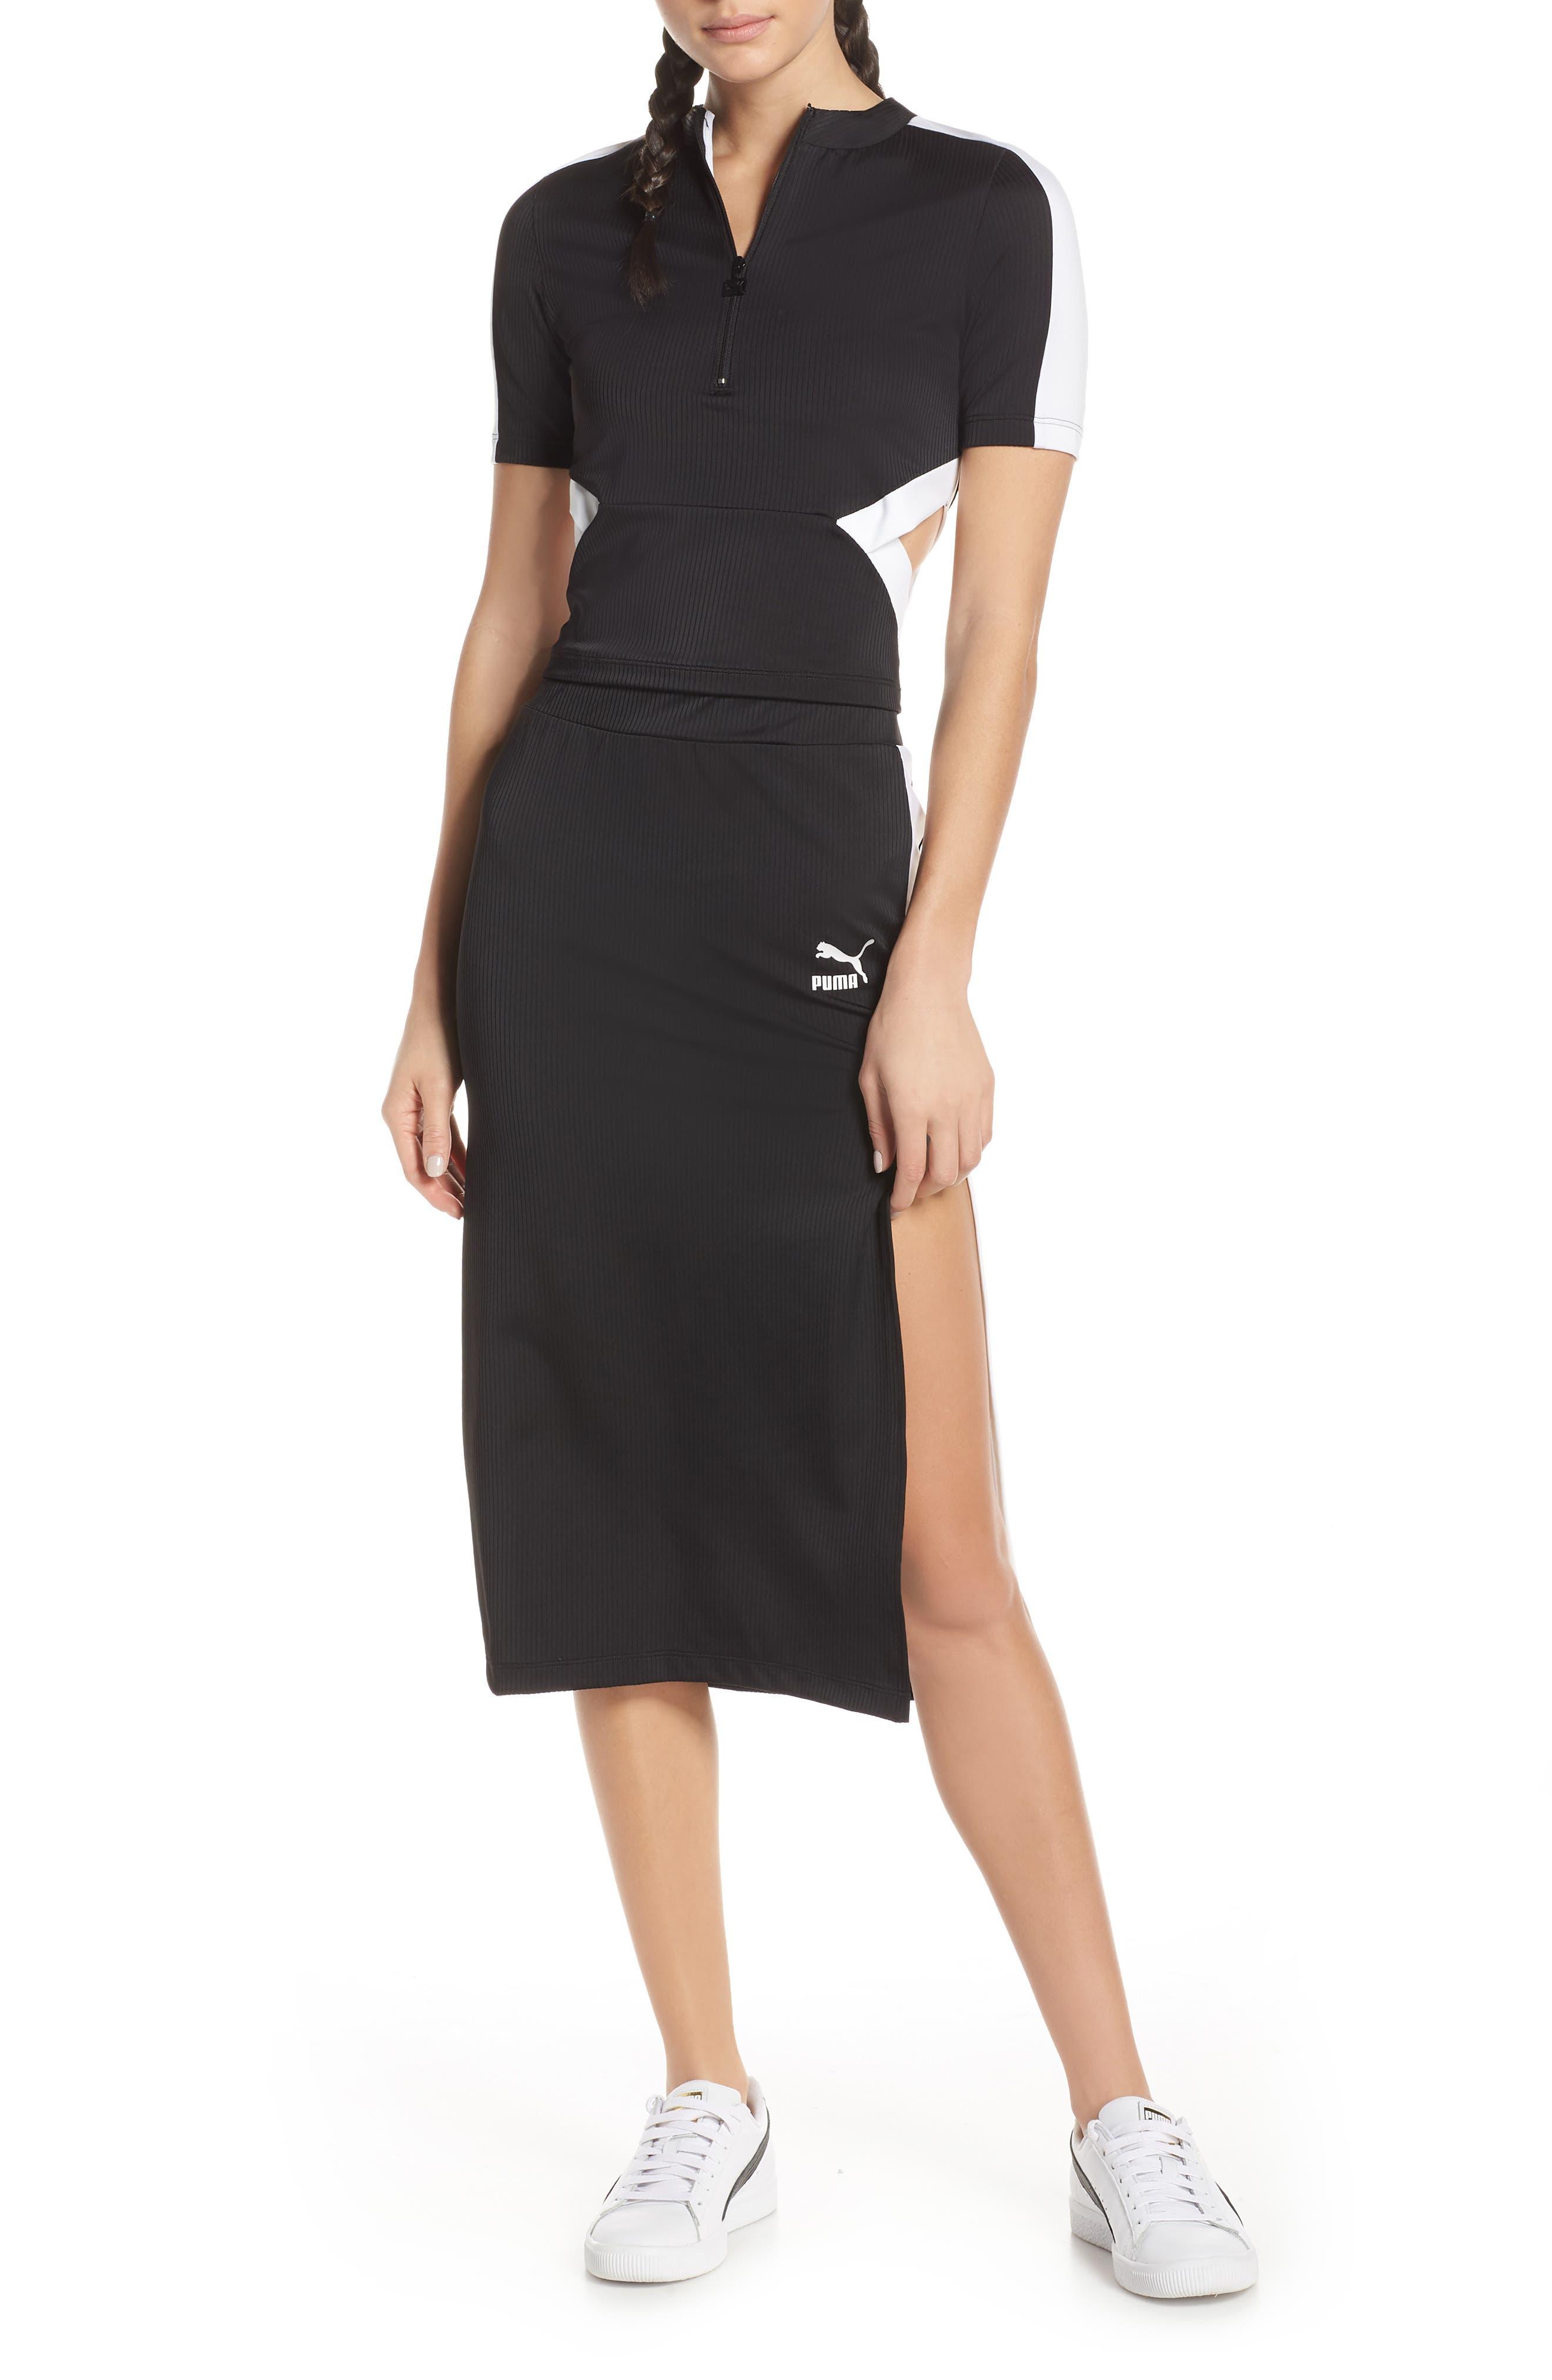 PUMA,                             Classics Ribbed Skirt,                             Alternate thumbnail 8, color,                             PUMA BLACK